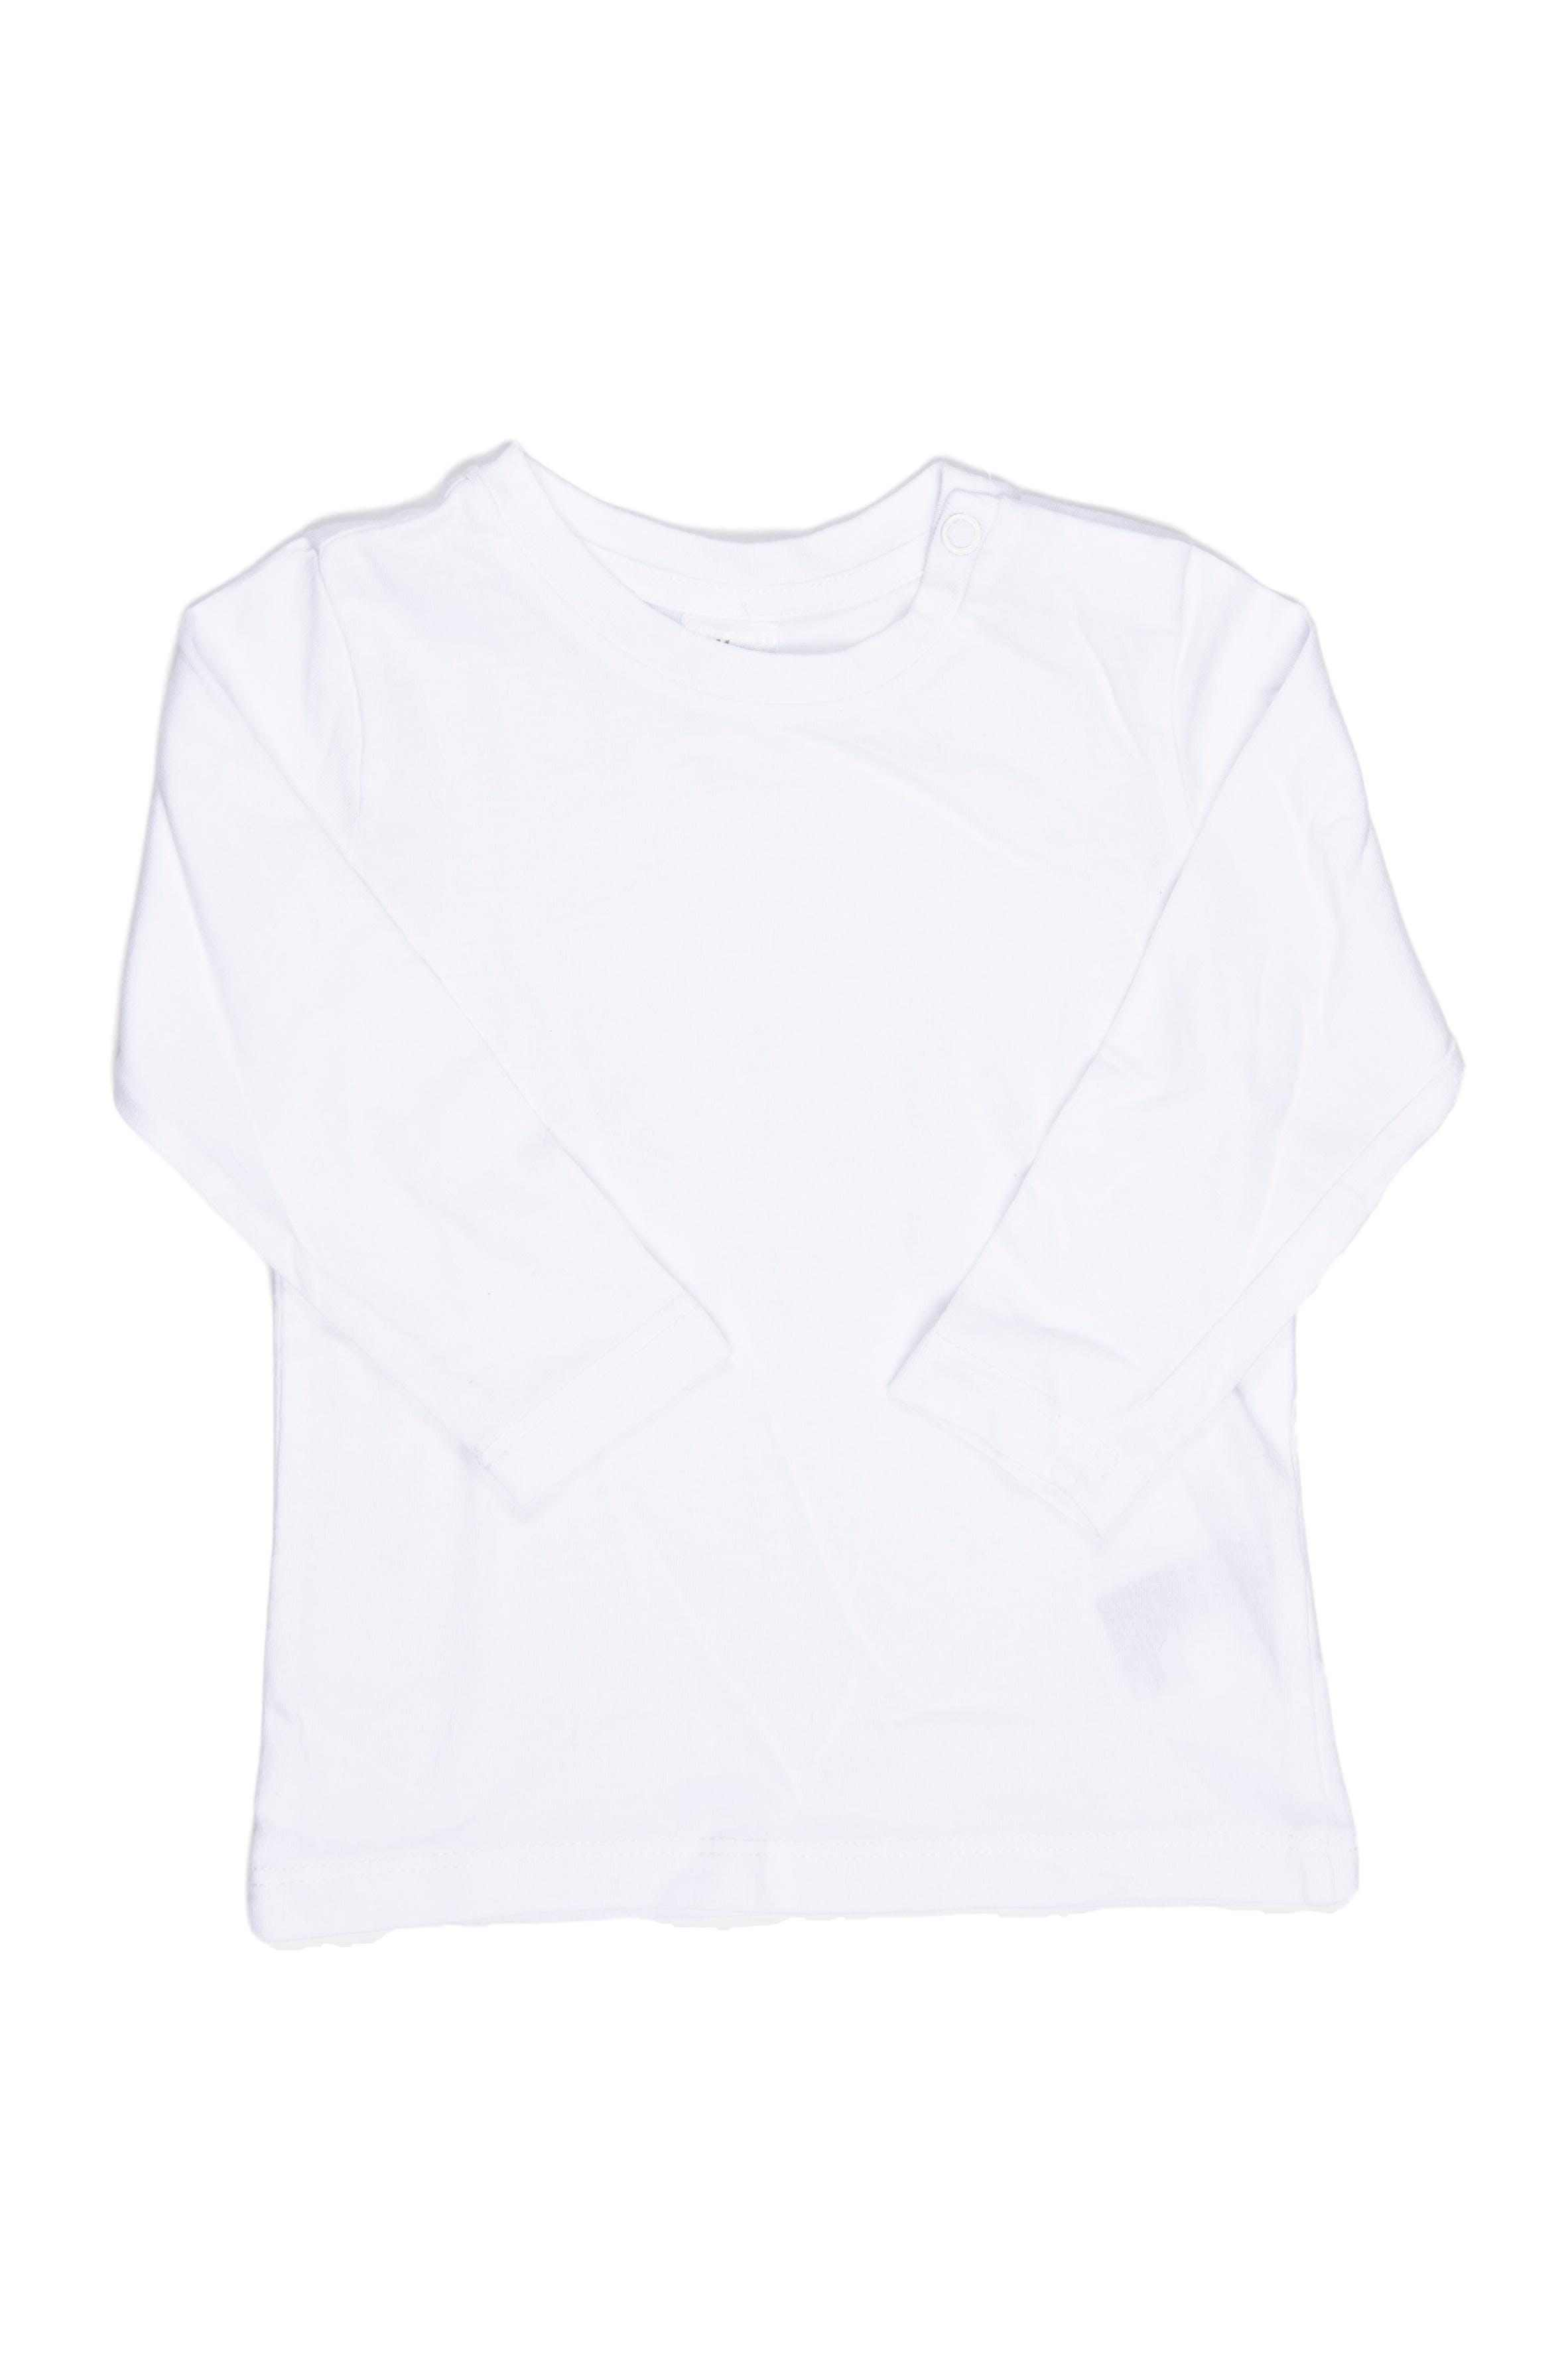 Polo blanco basico manga larga 100% algodón - H & M